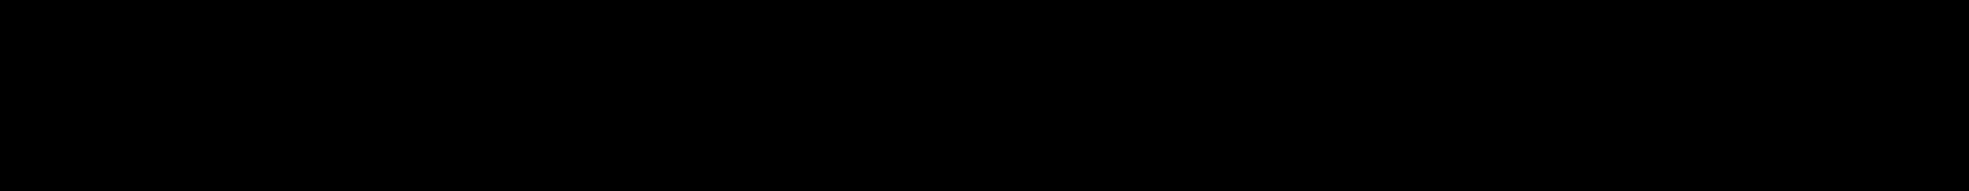 Design System C 100I